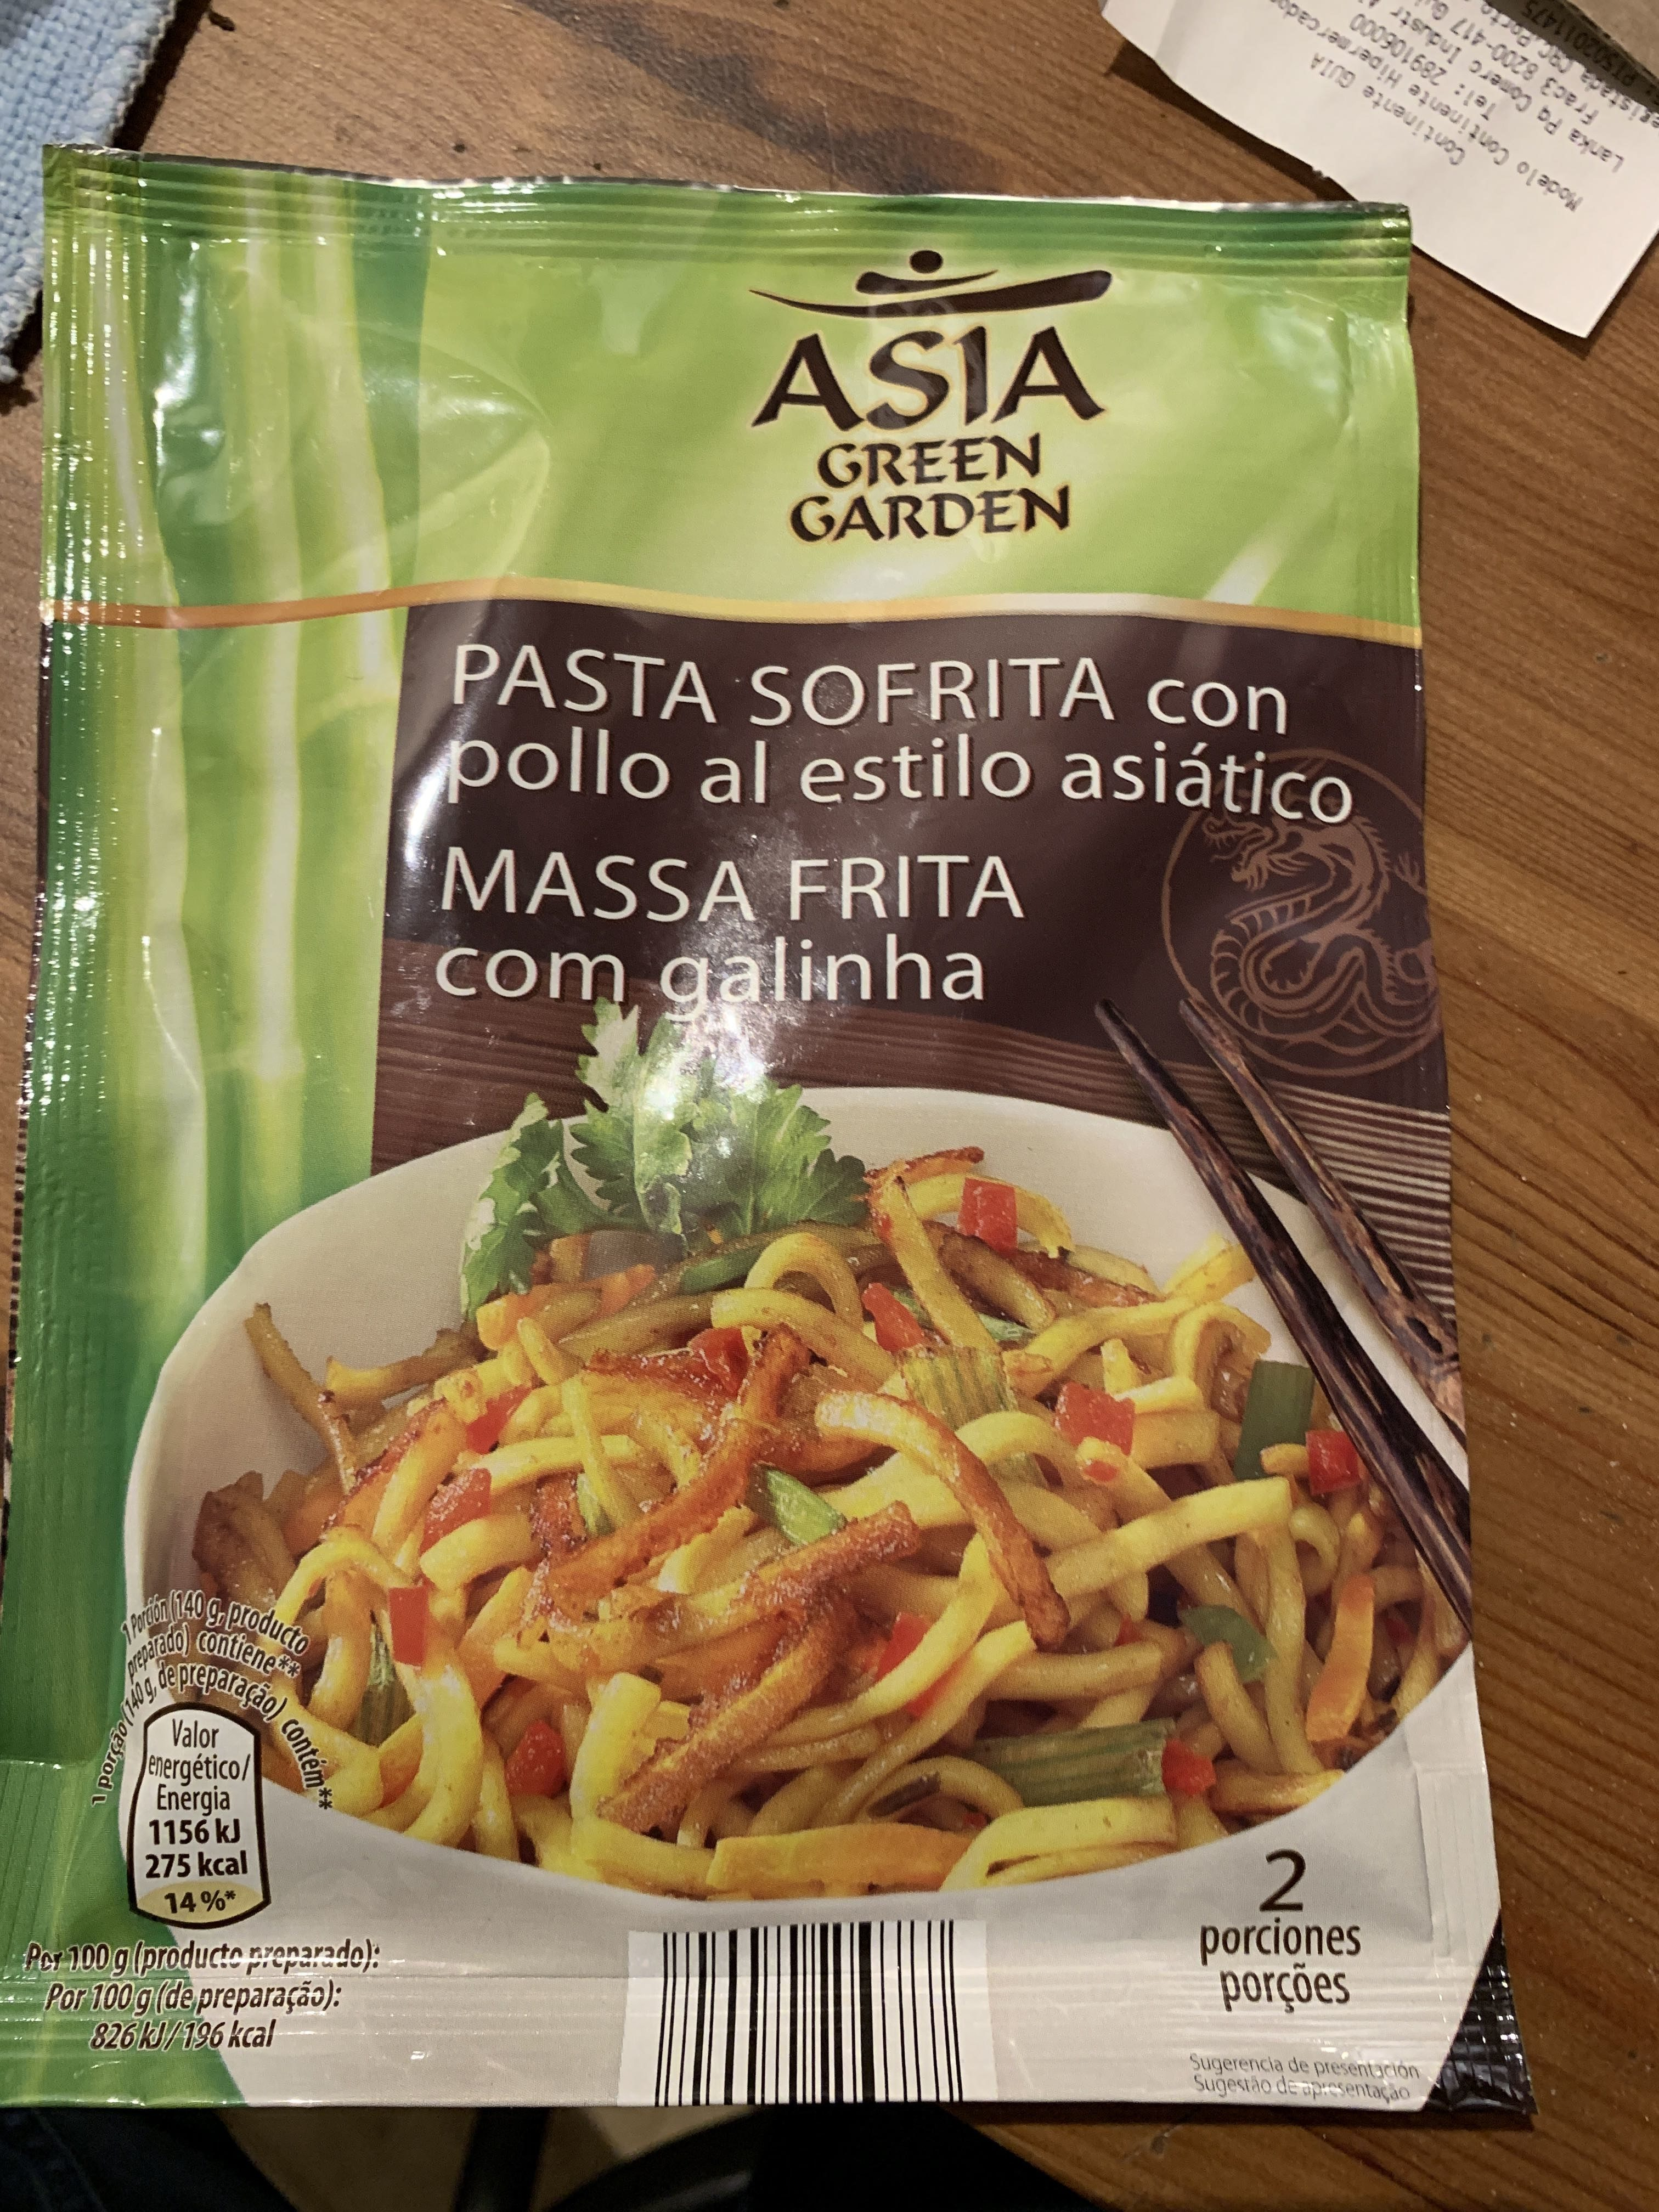 Pasta so frita estilo asiático - Product - fr